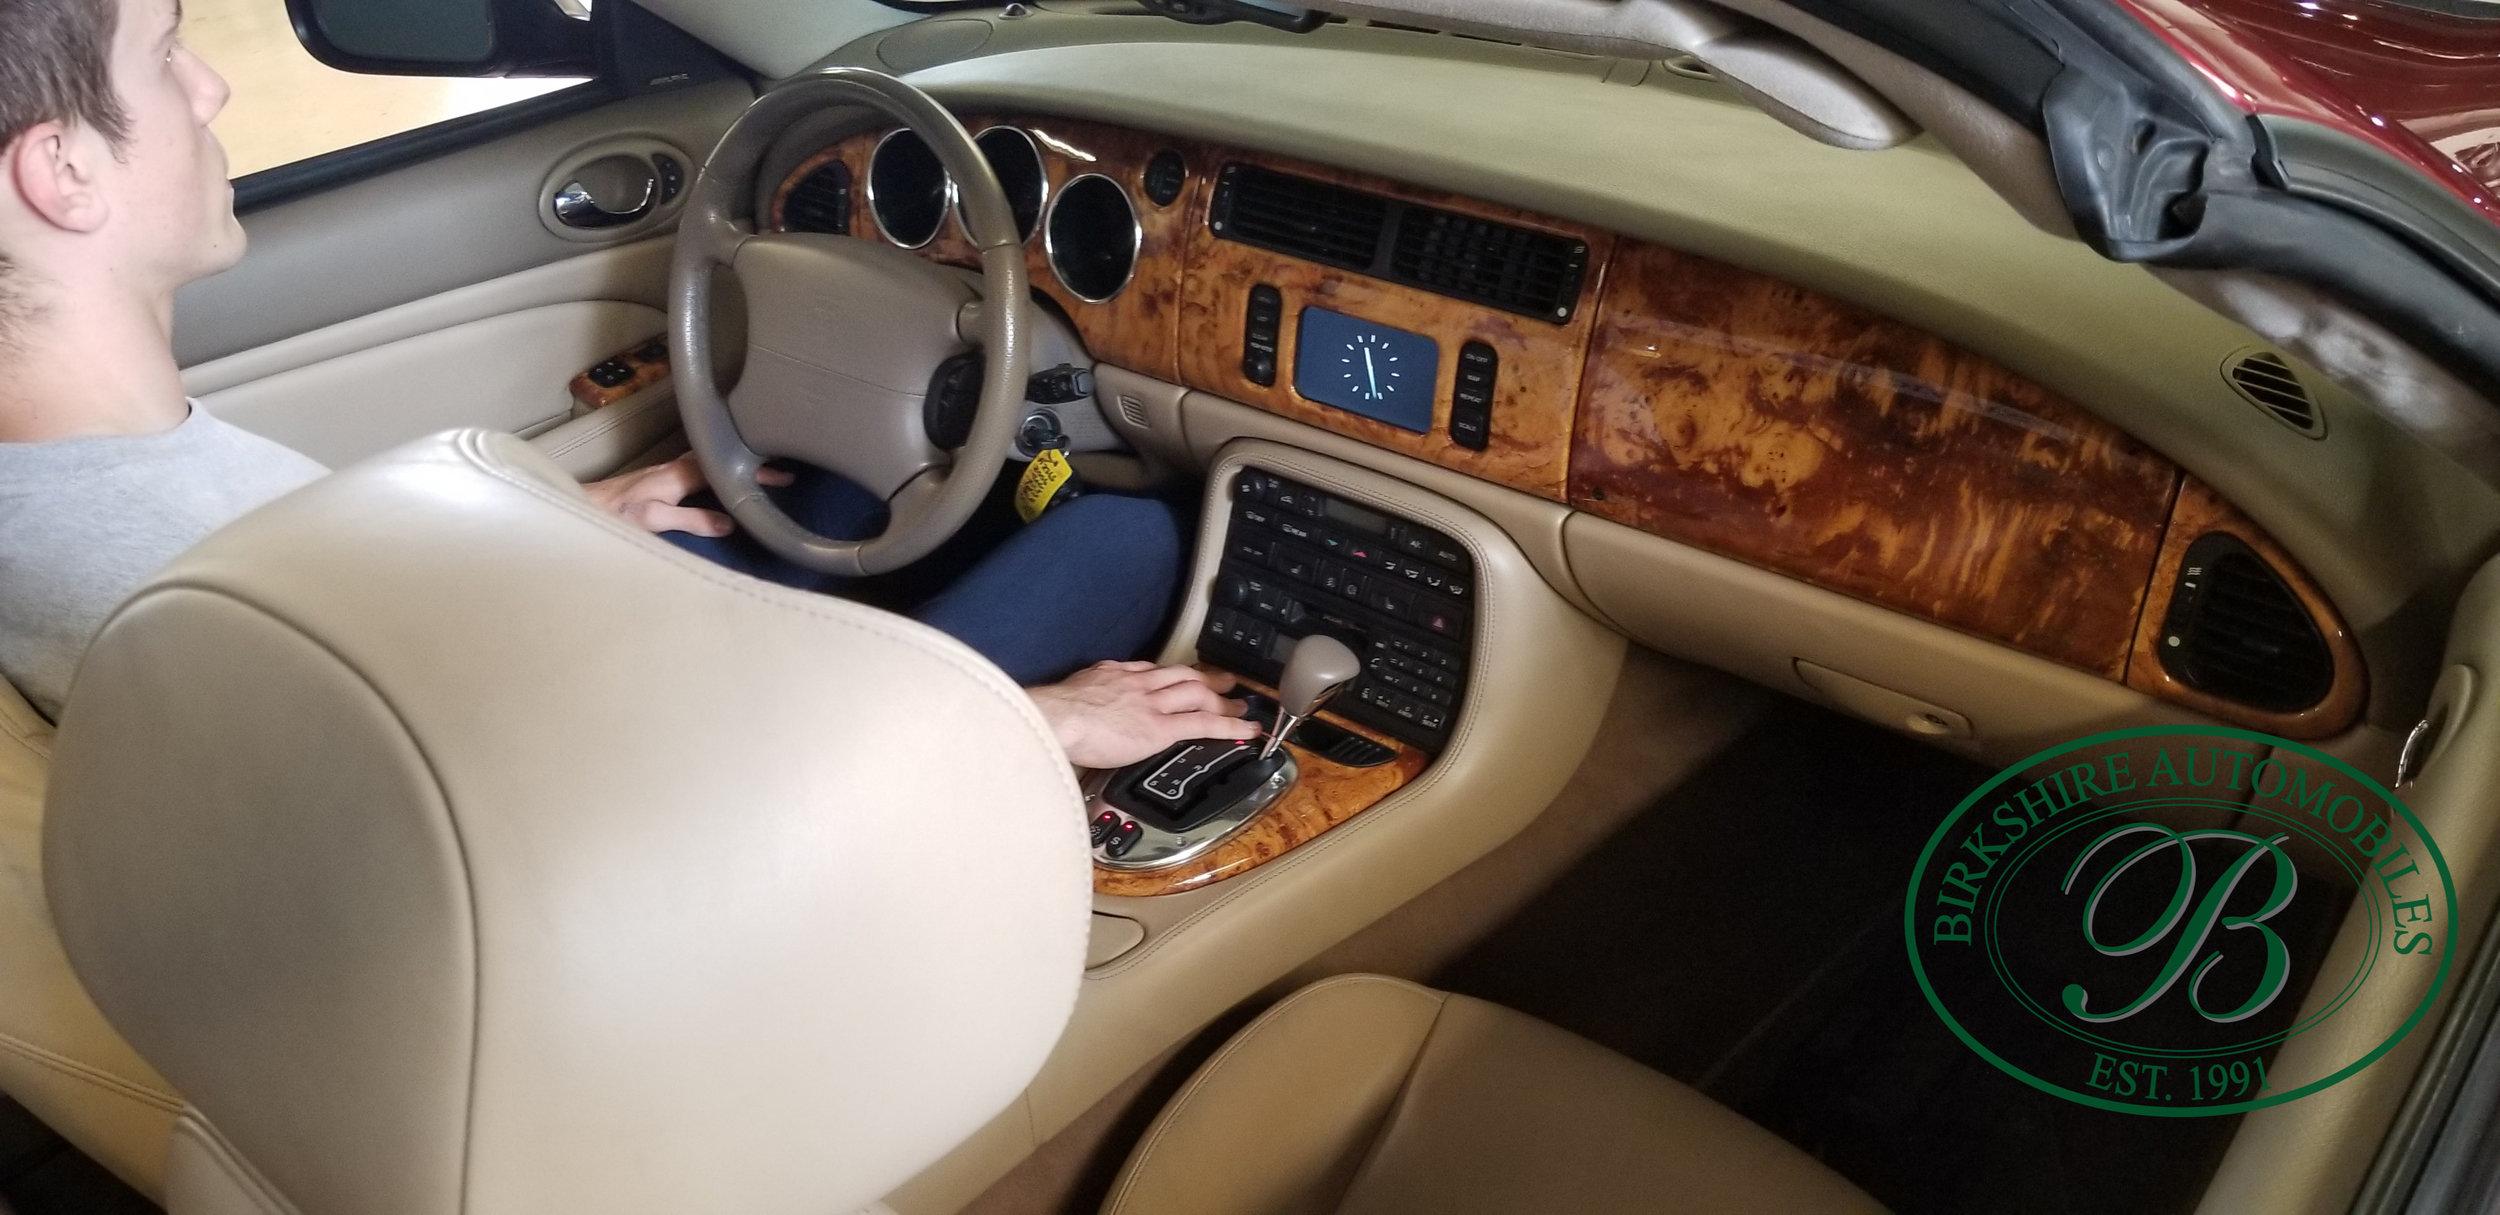 2006 Jaguar XK8 Convertible - Birkshire Automobiles Thornhill (37).jpg